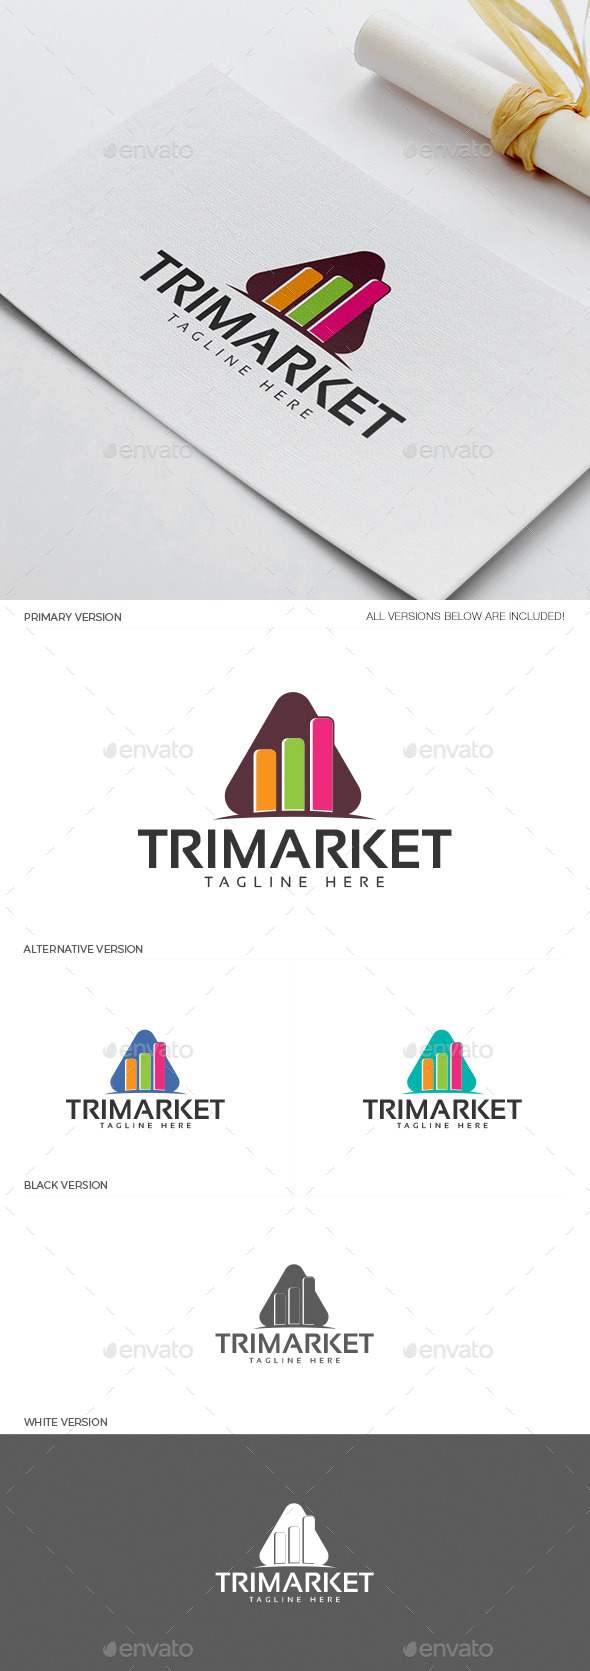 Trimarket Logo